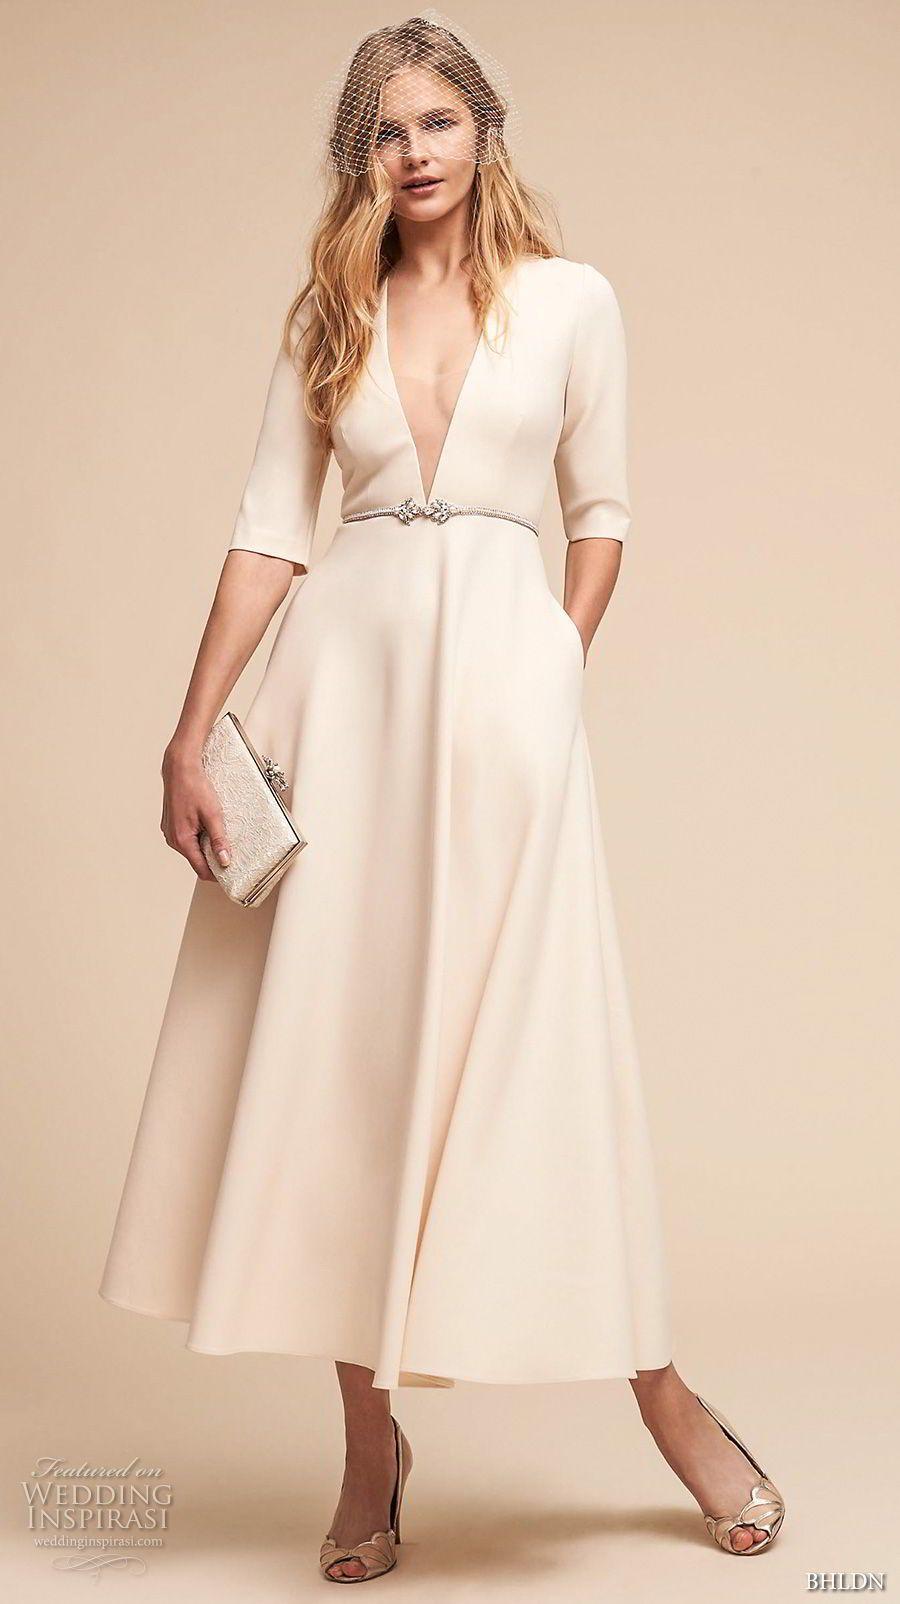 Bhldn spring wedding dresses short wedding dresses ankle